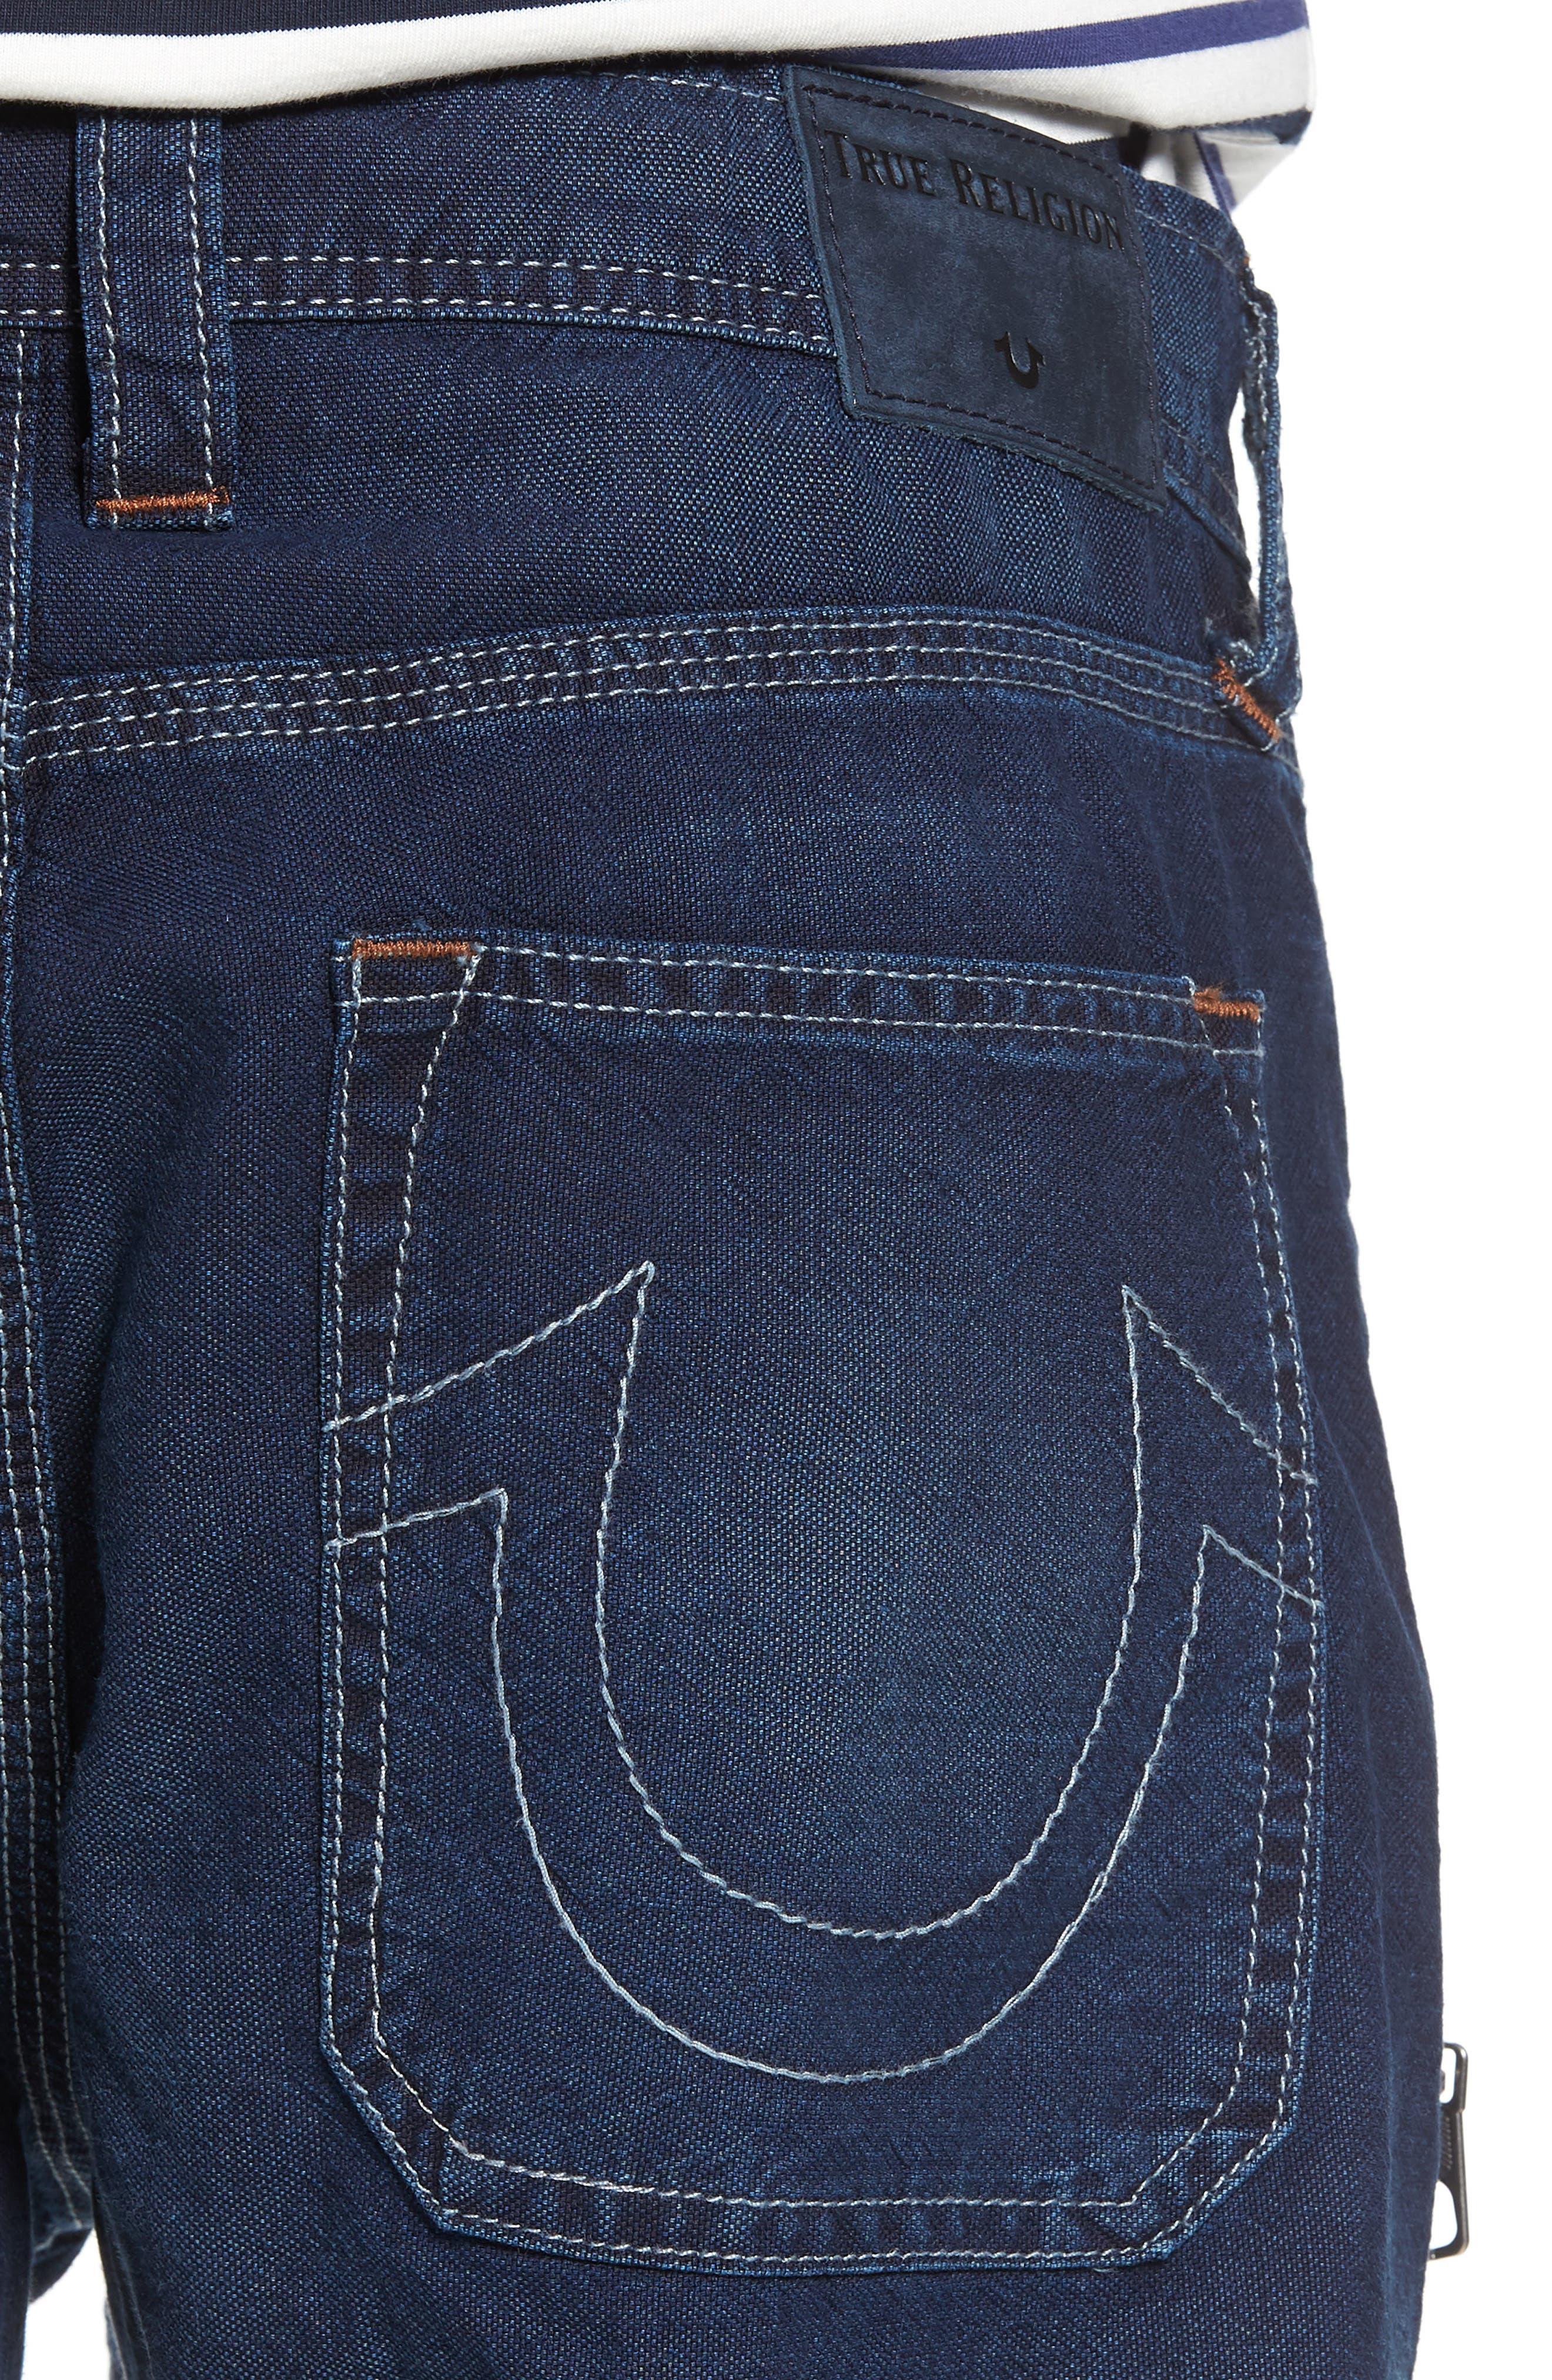 Trail Utility Jeans,                             Alternate thumbnail 4, color,                             UNION SPECIAL